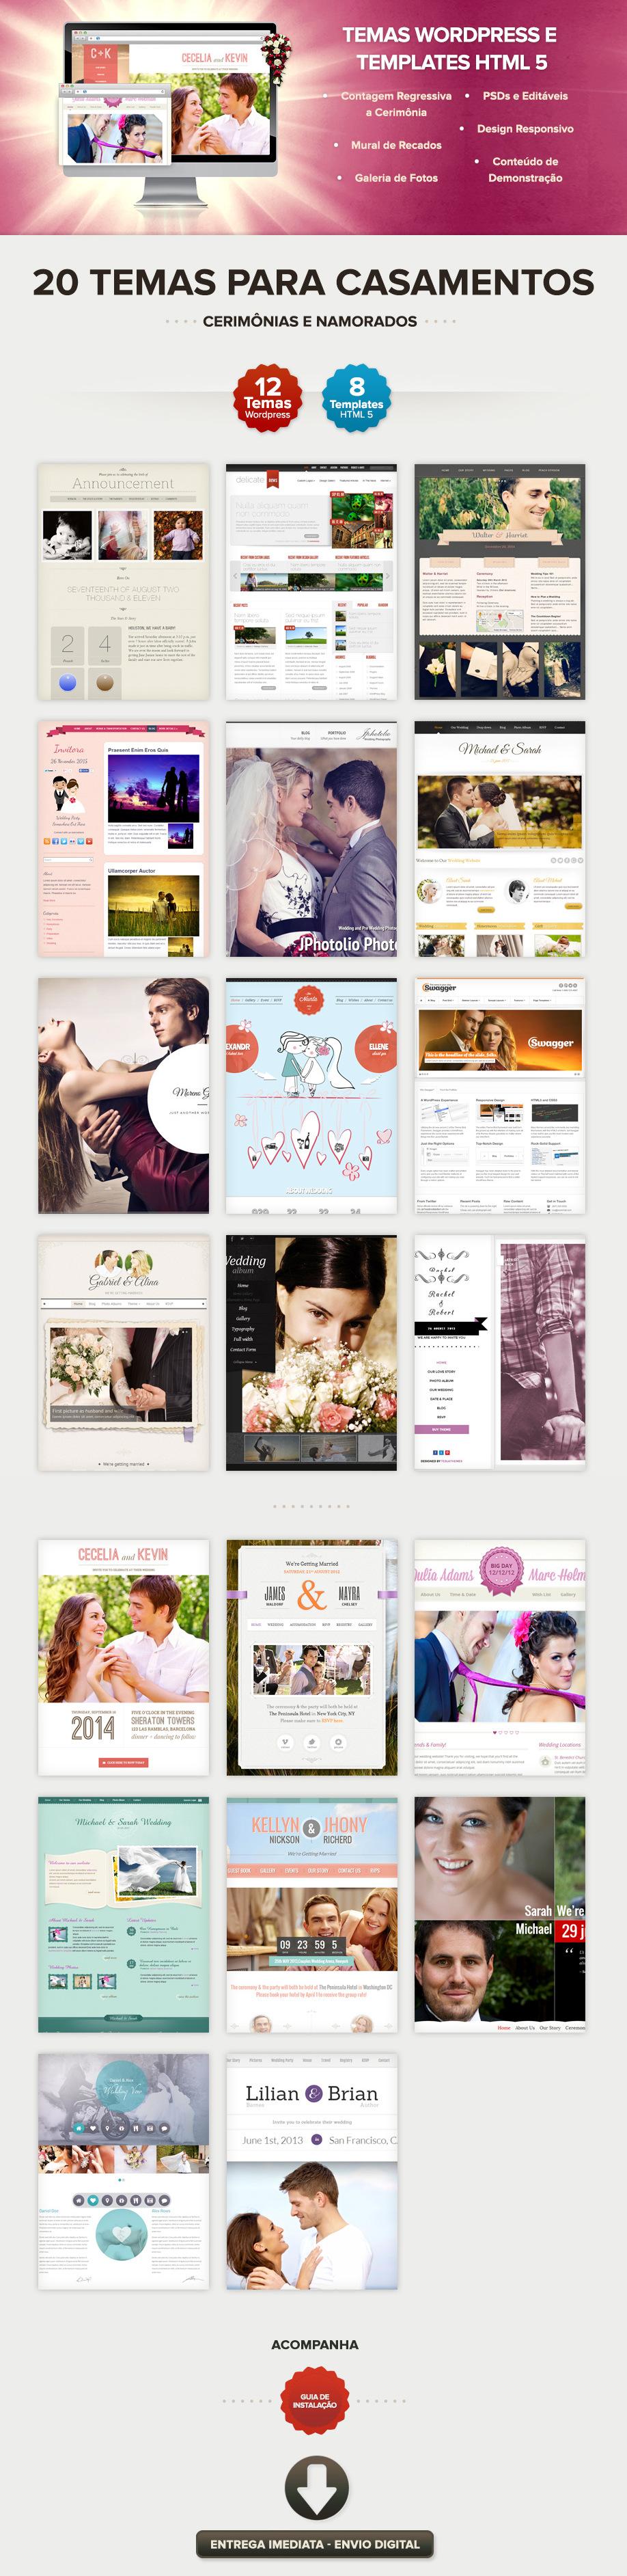 layout145.jpg